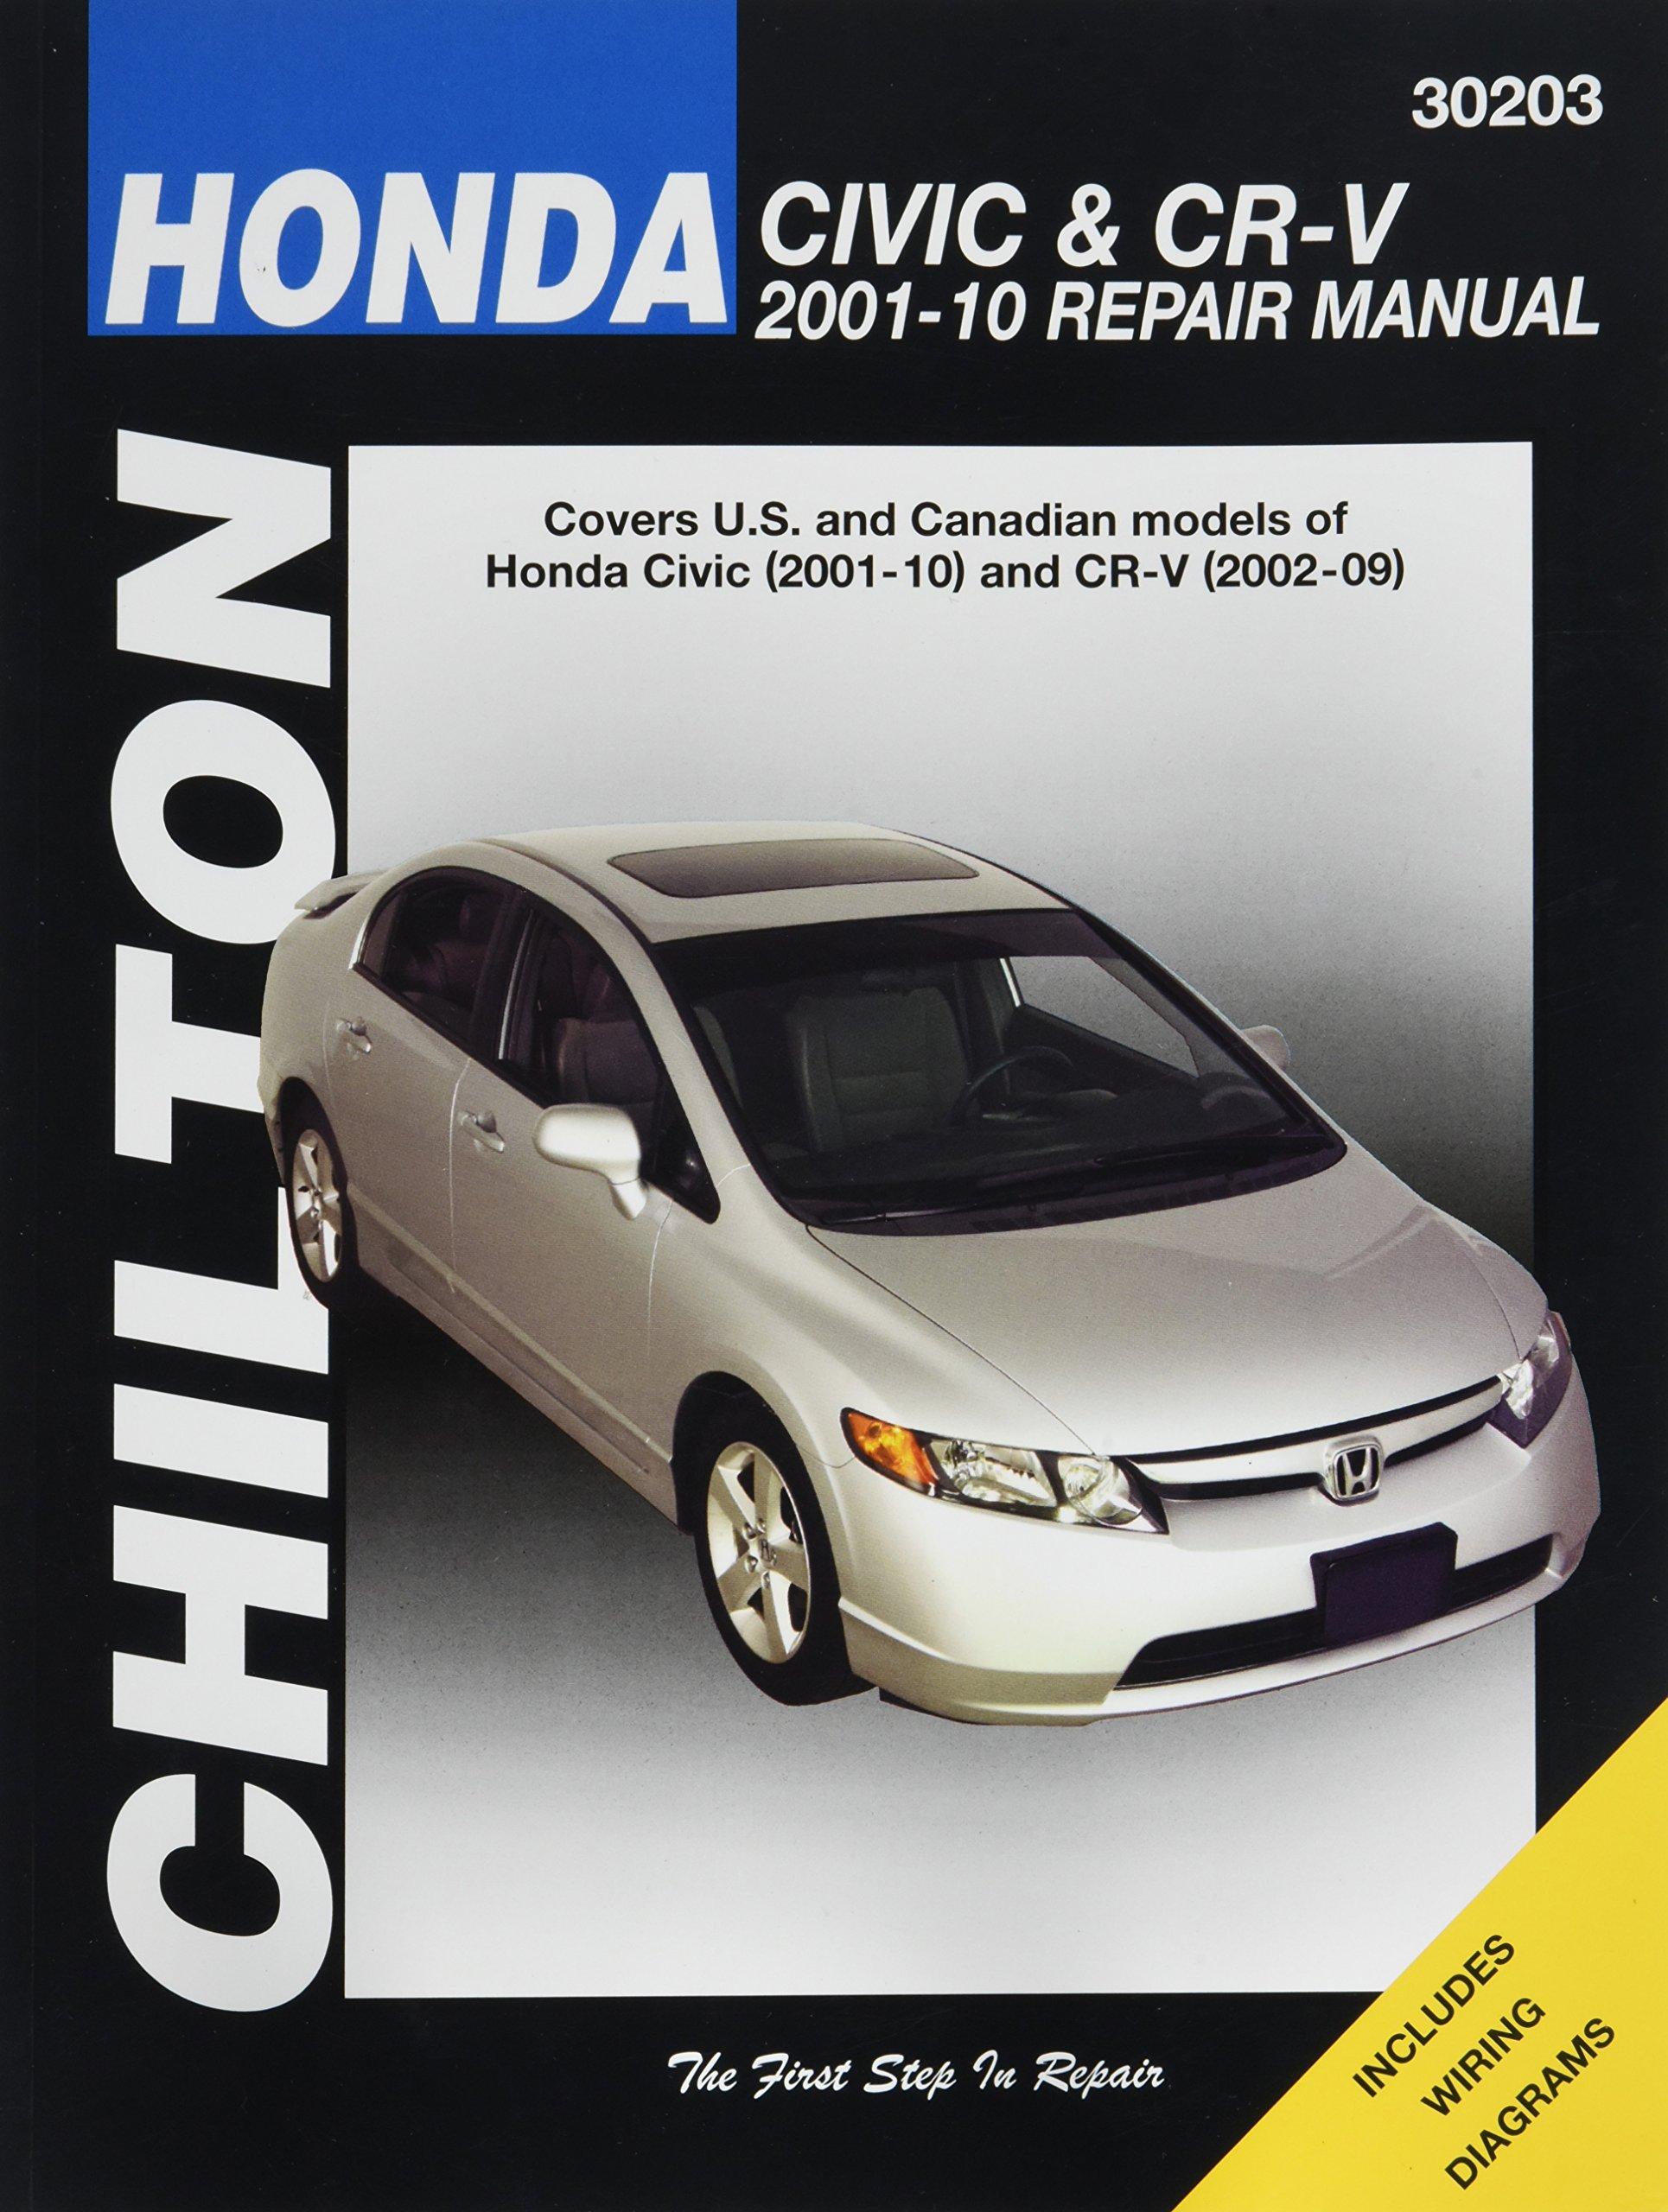 Chilton Honda Civic (2001-10) and CR-V (2002-09) Repair Manual (30203):  0035675302036: Amazon.com: Books